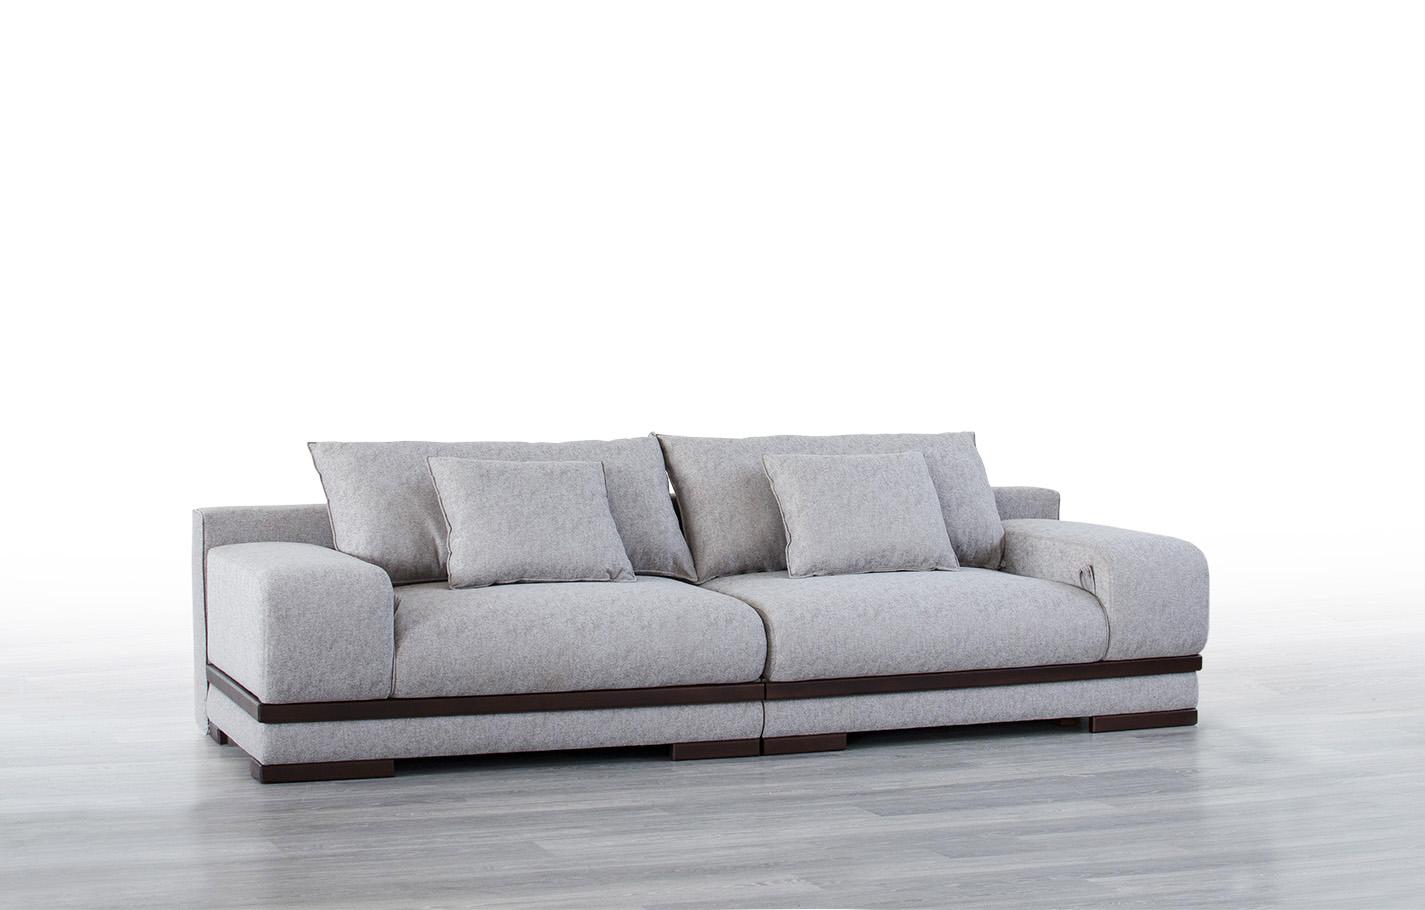 sofa_komfort-2_2-1